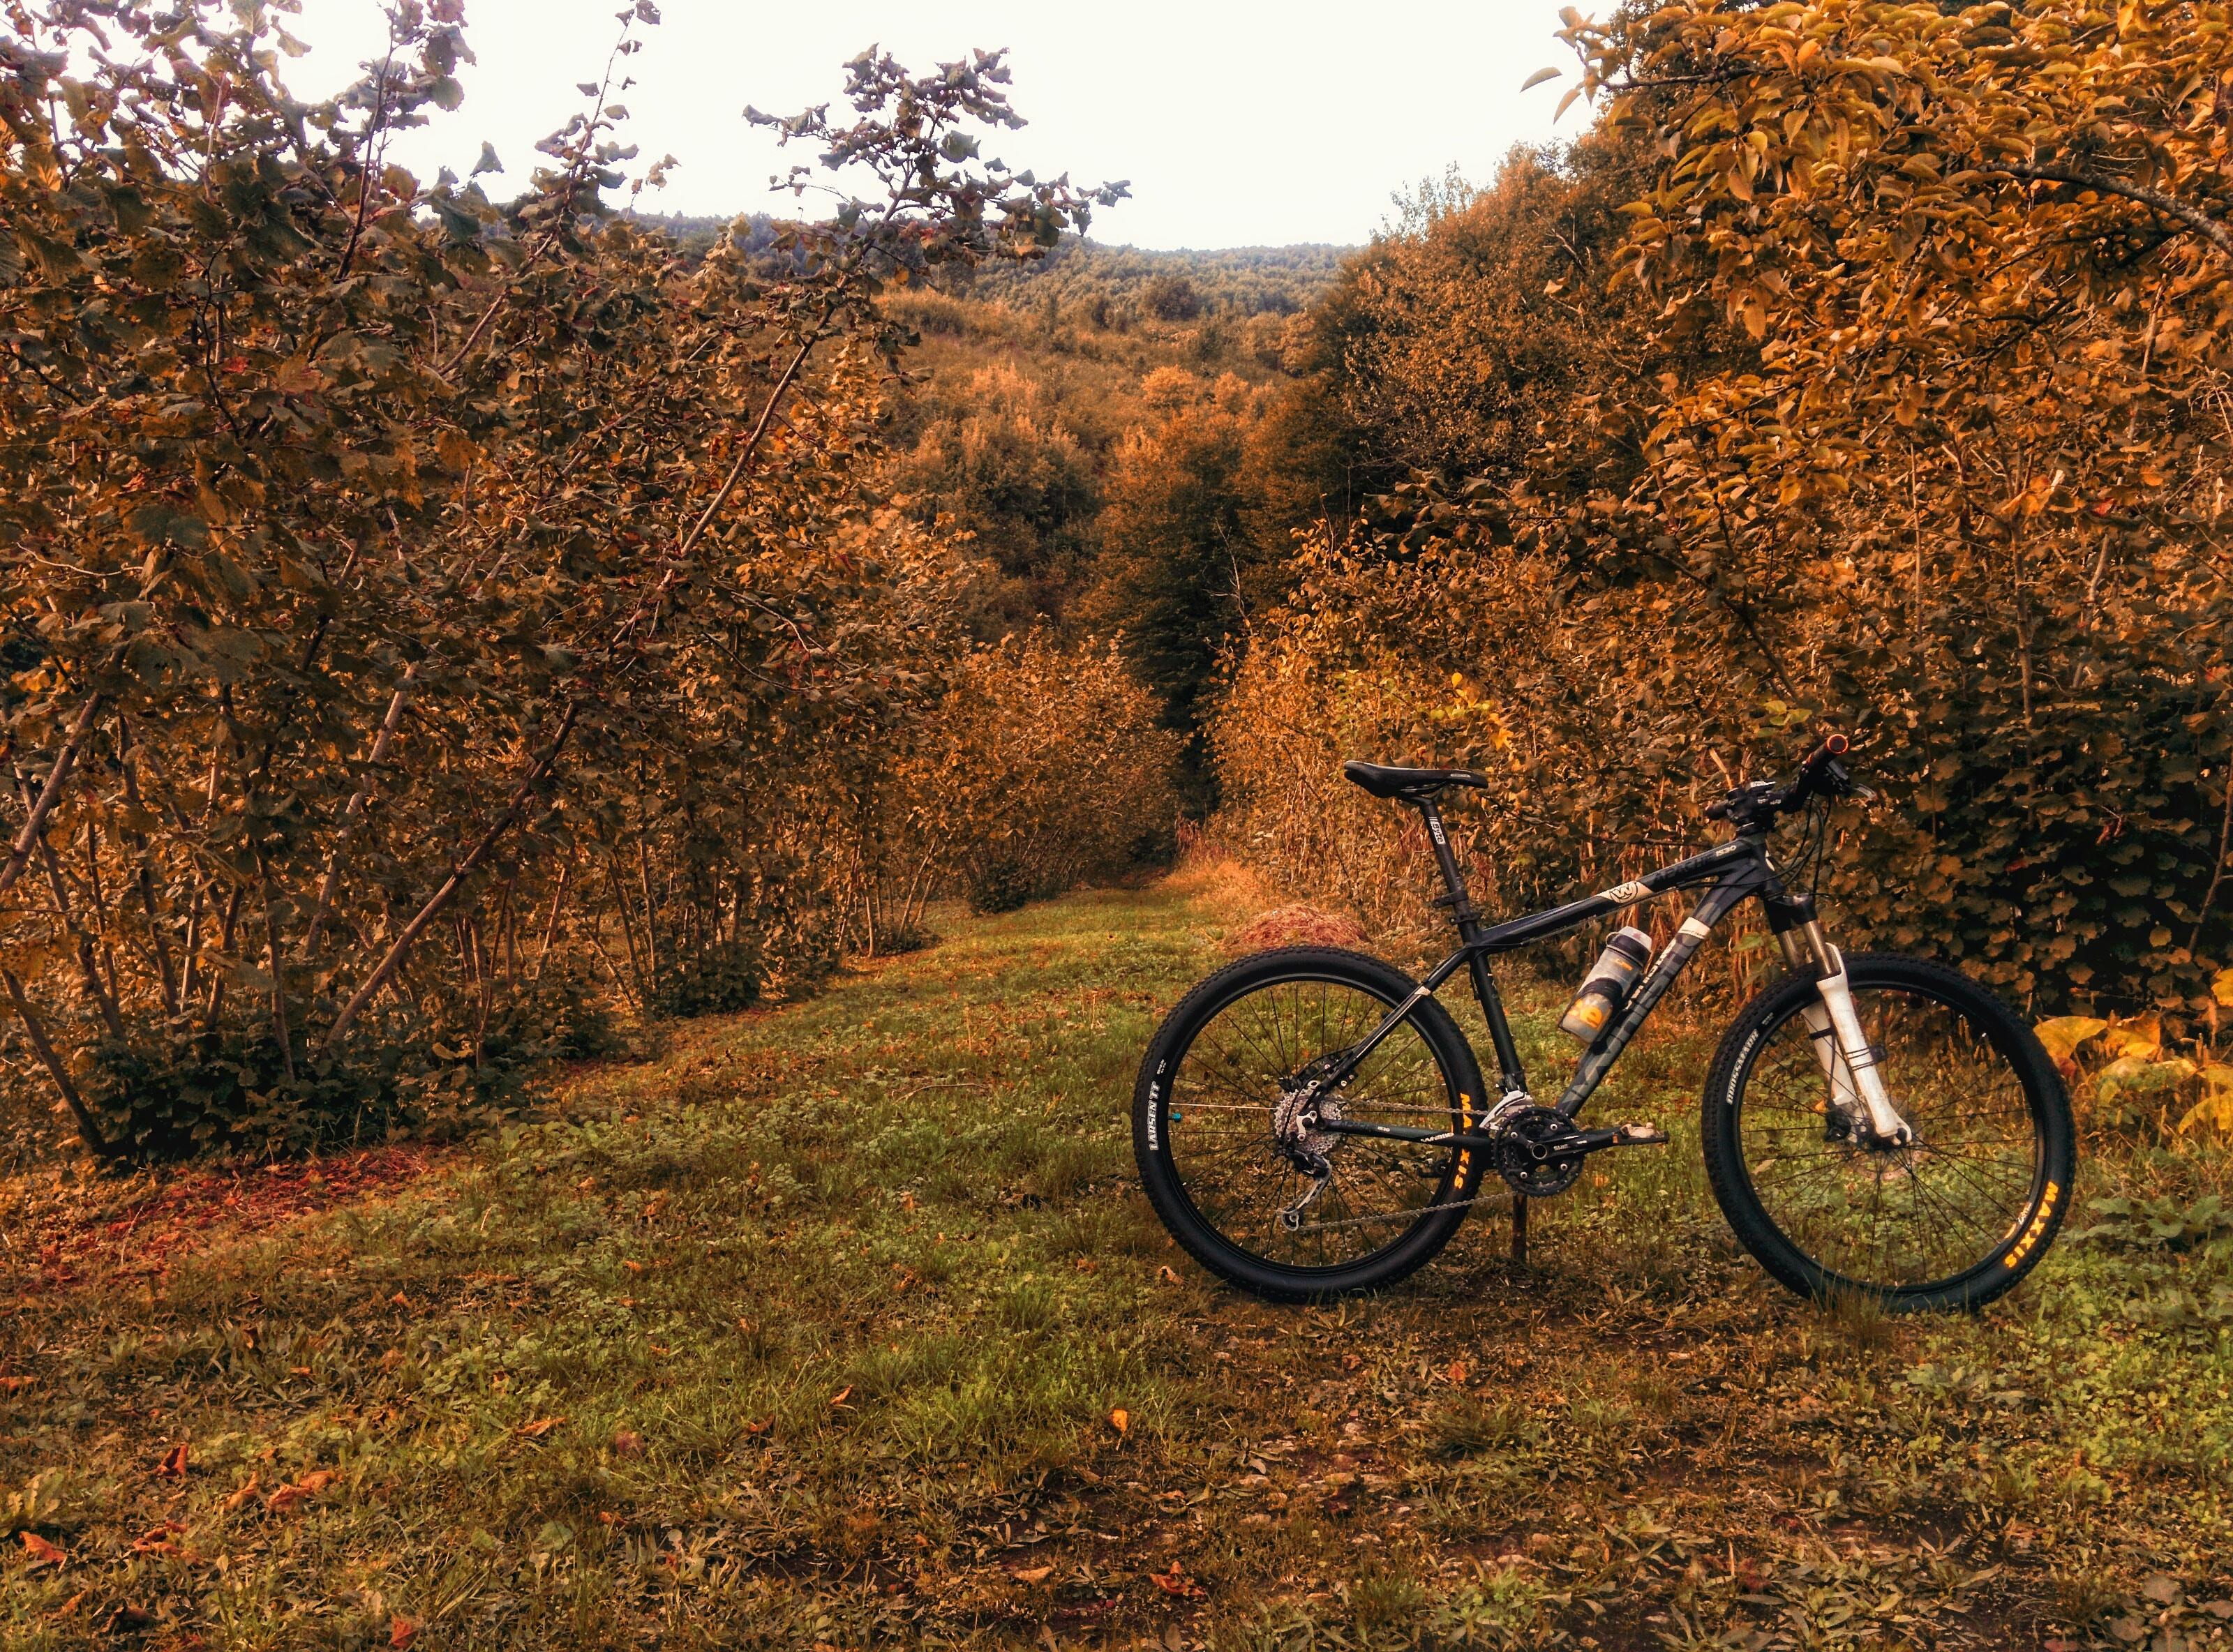 hardtail bike on grass field between trees